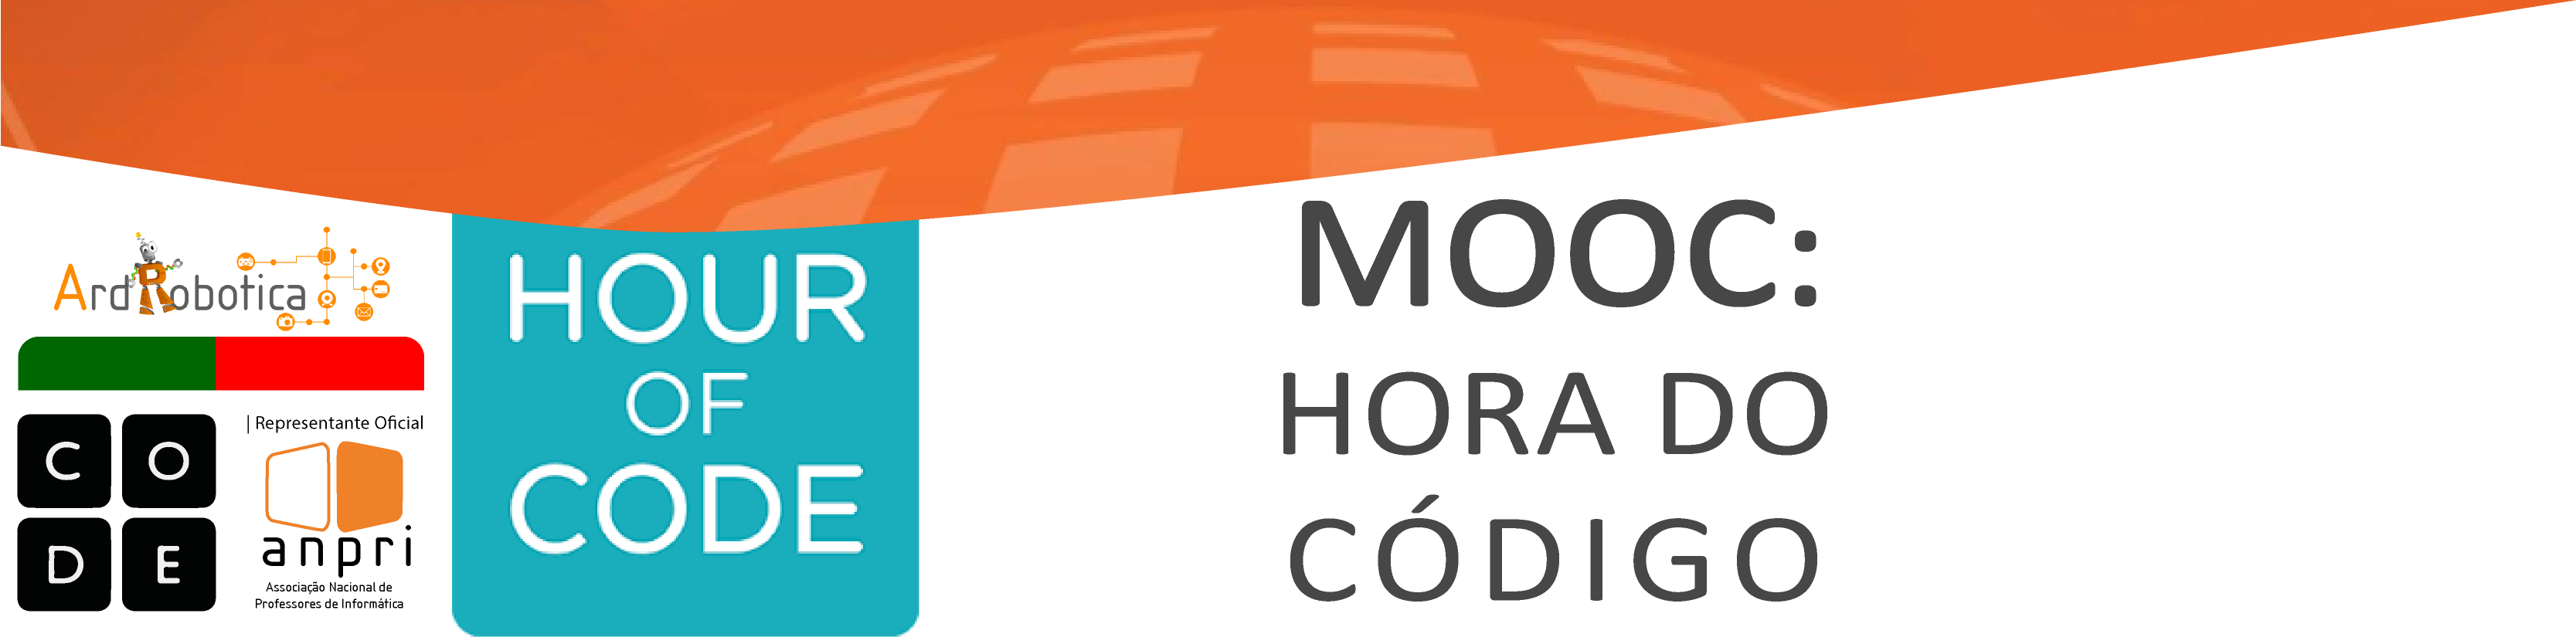 MOOC: HORA DO CÓDIGO